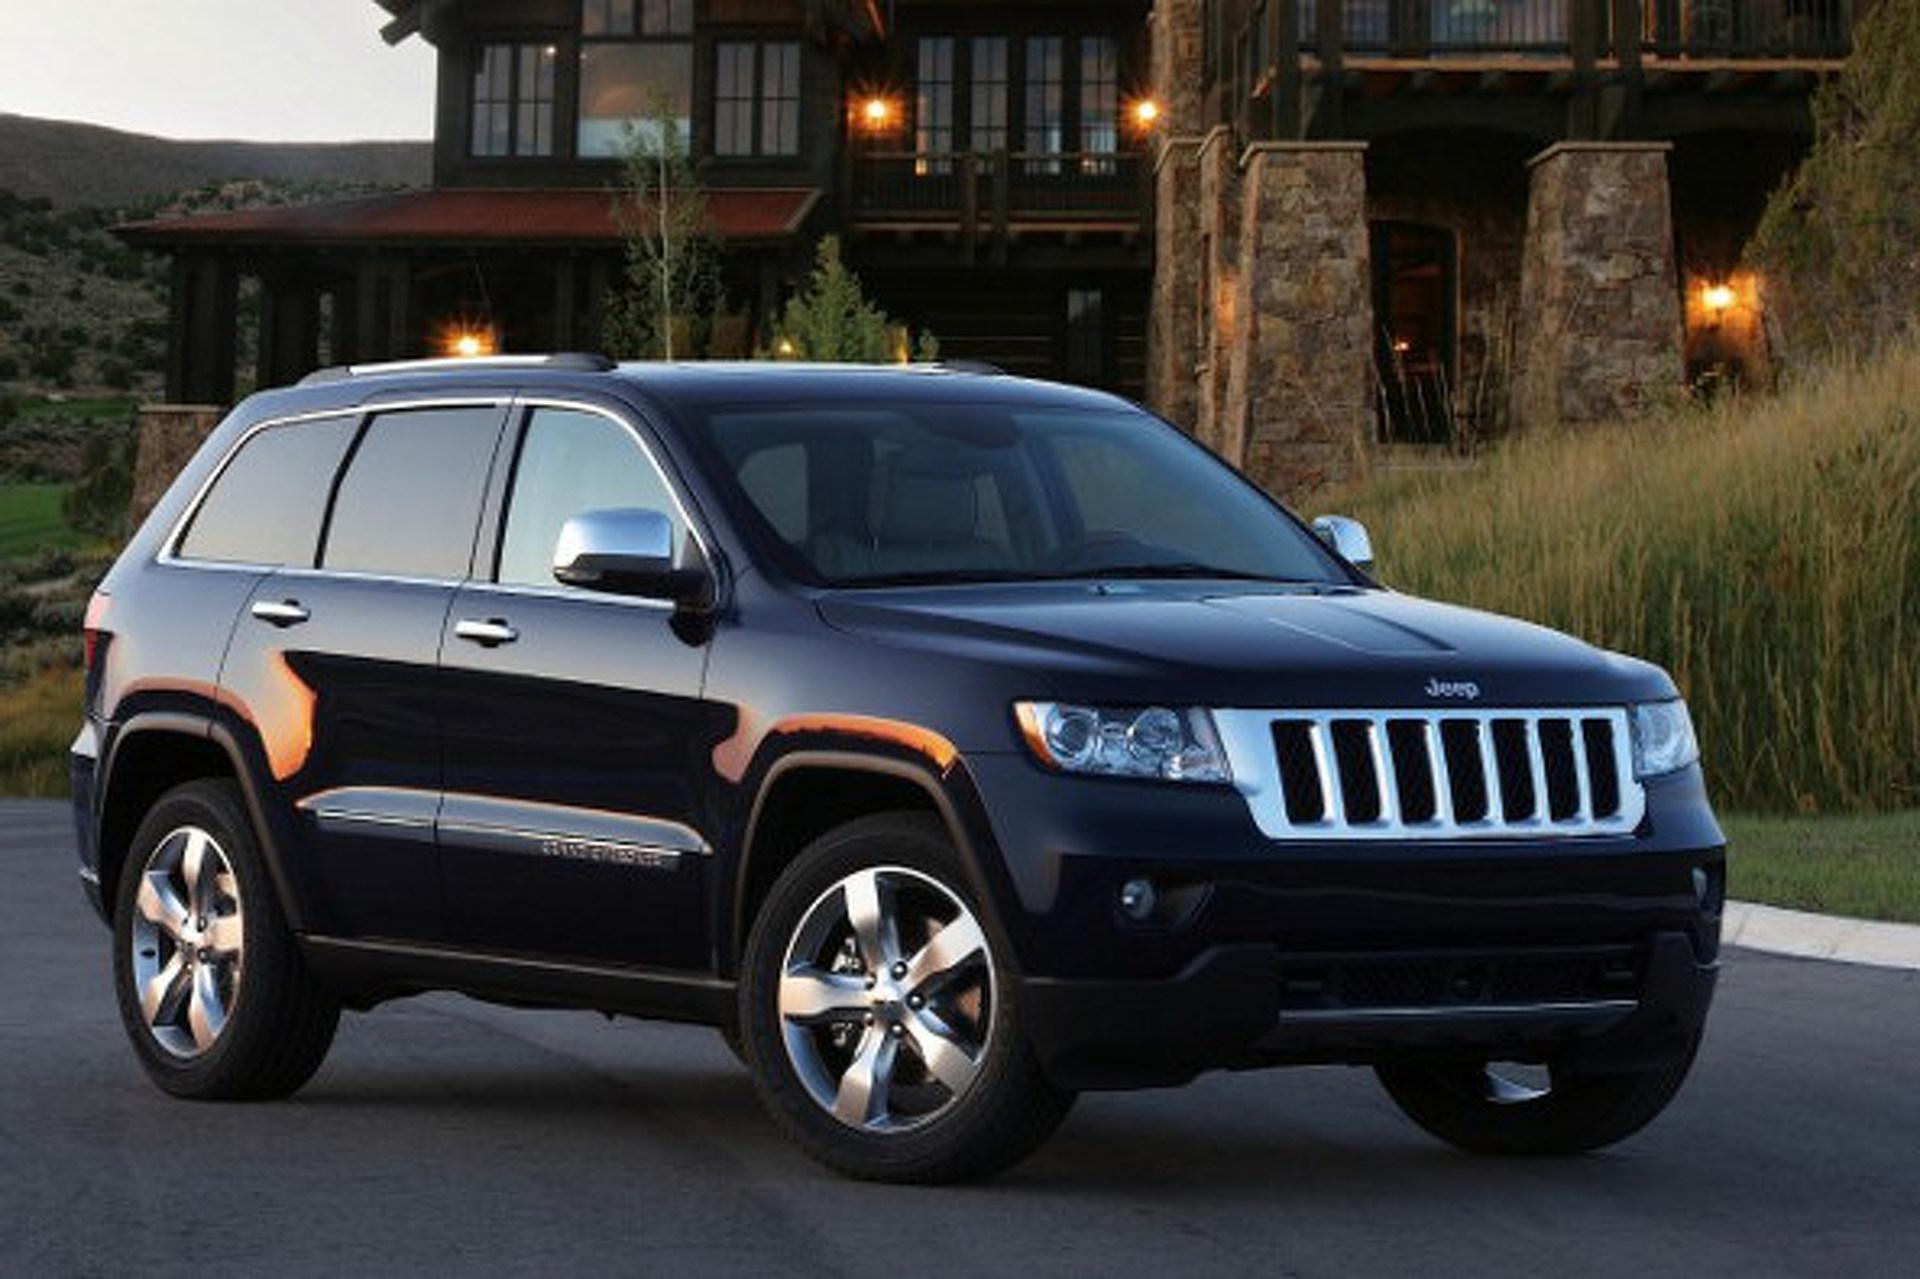 How the Jeep Grand Cherokee Saved Chrysler